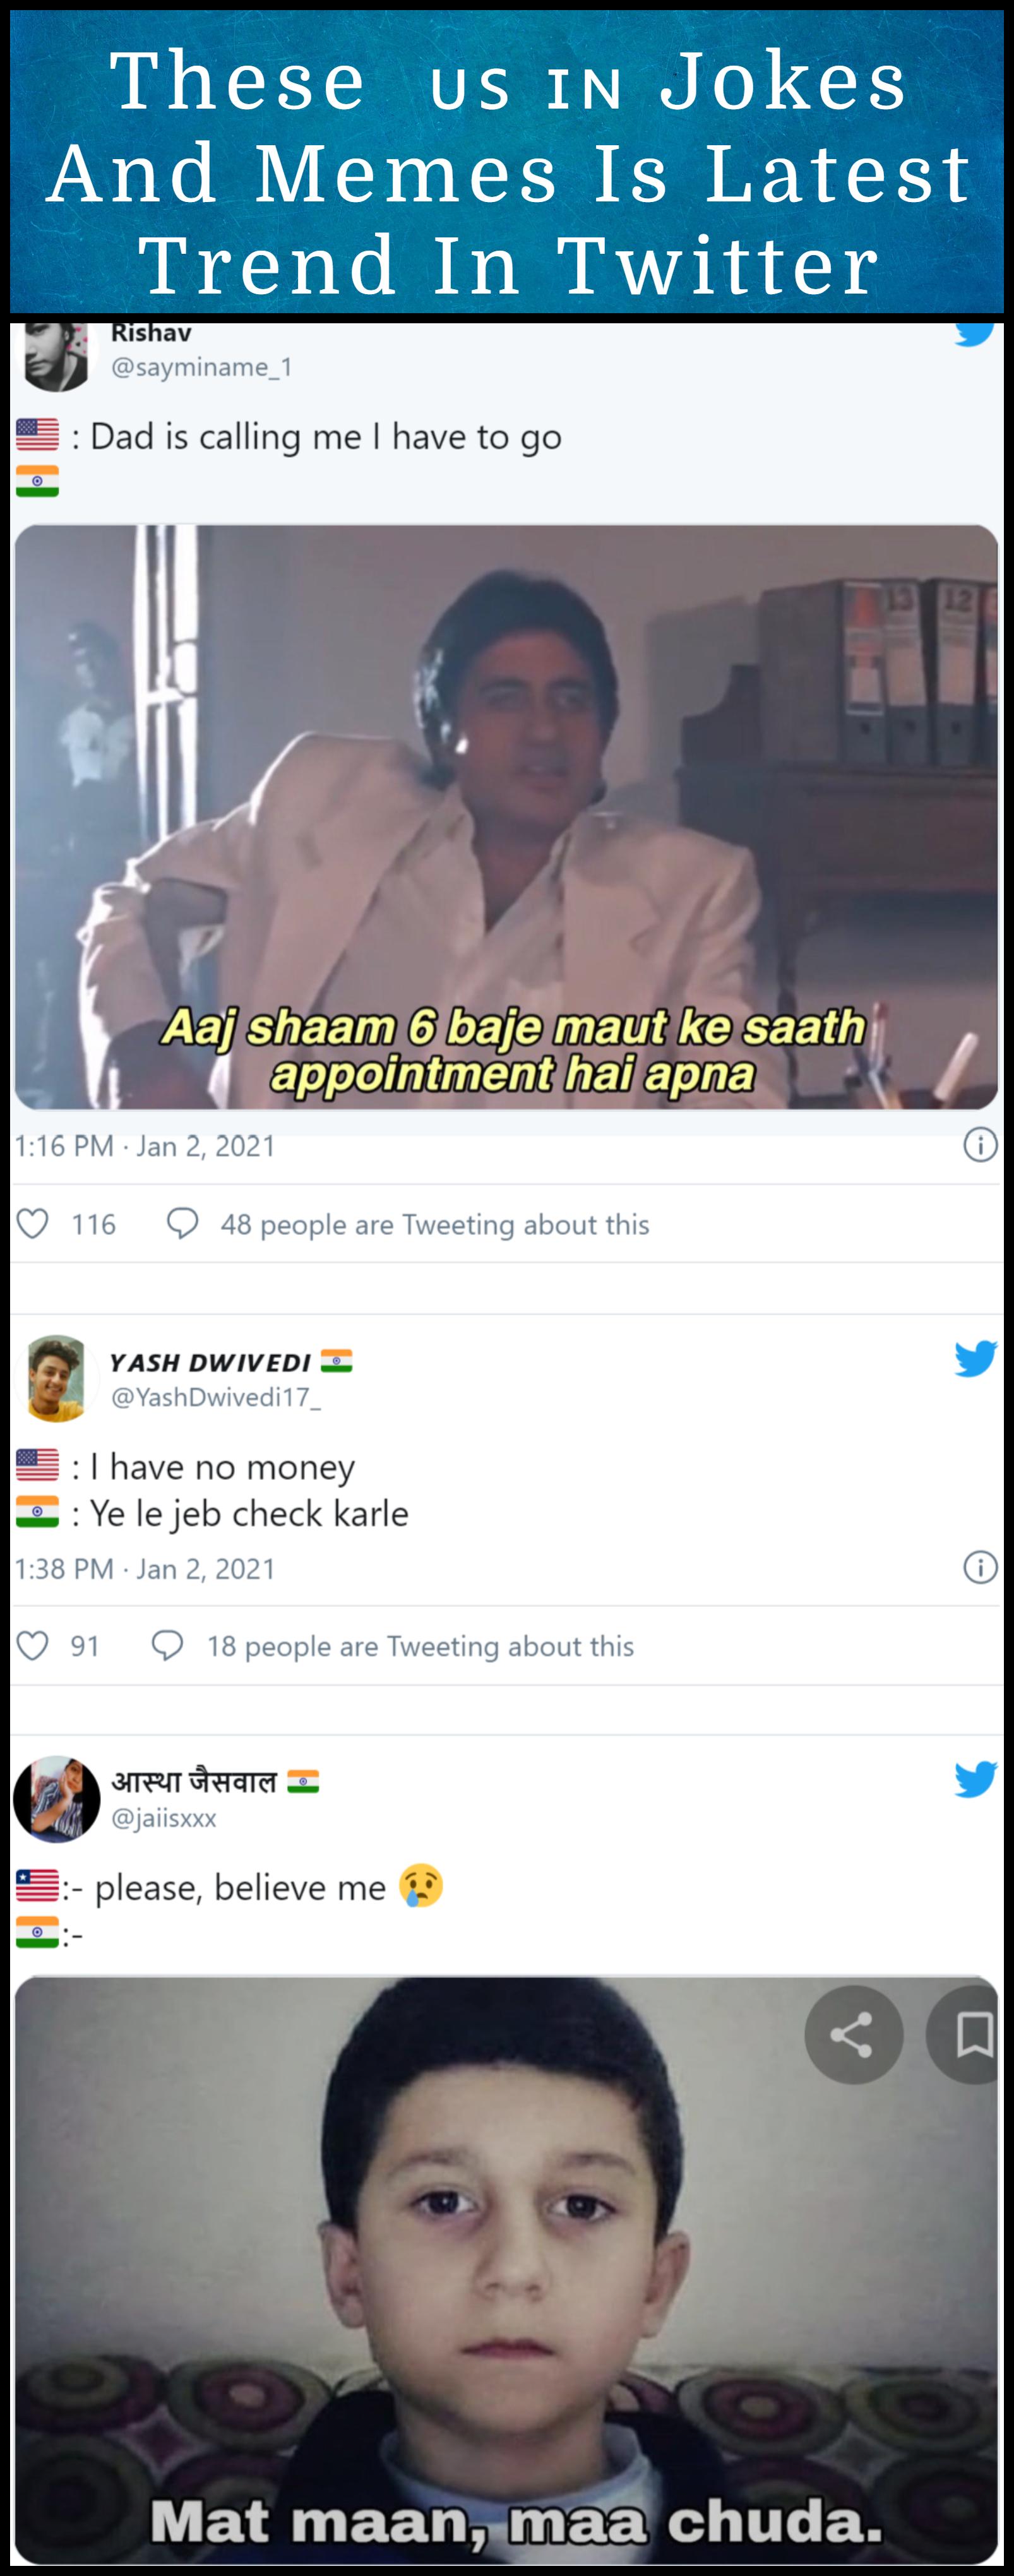 These Jokes And Memes Is Latest Trend In Twitter In 2021 Jokes Memes Twitter Trending